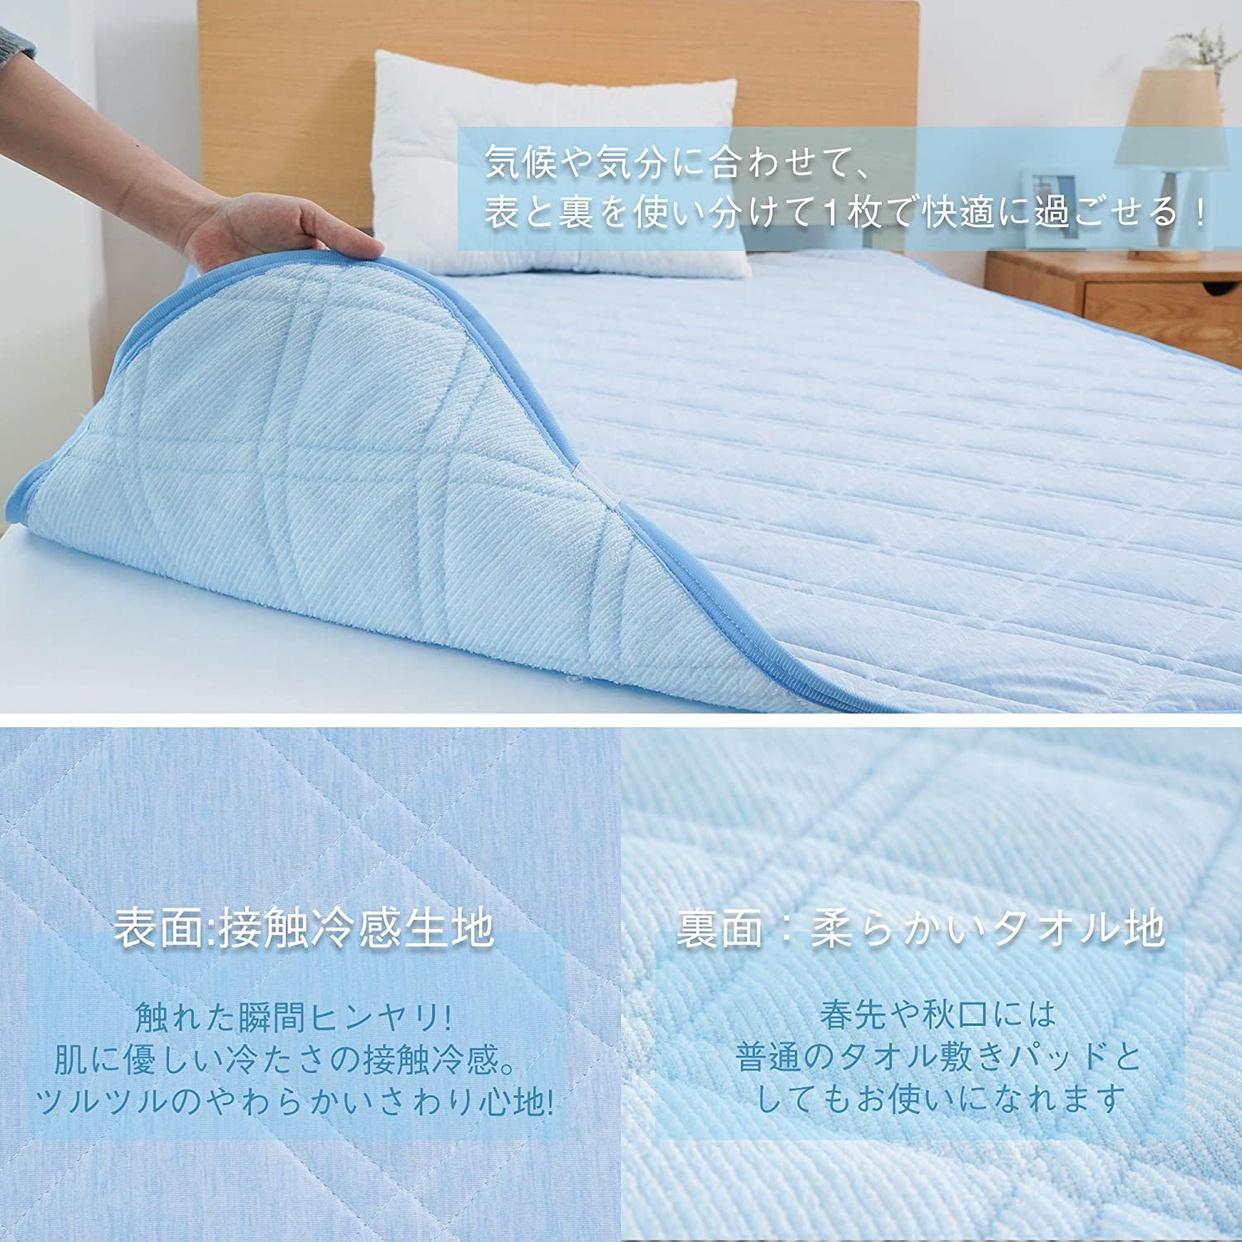 mensu(メンス) ひんやり 敷きパッドの商品画像4